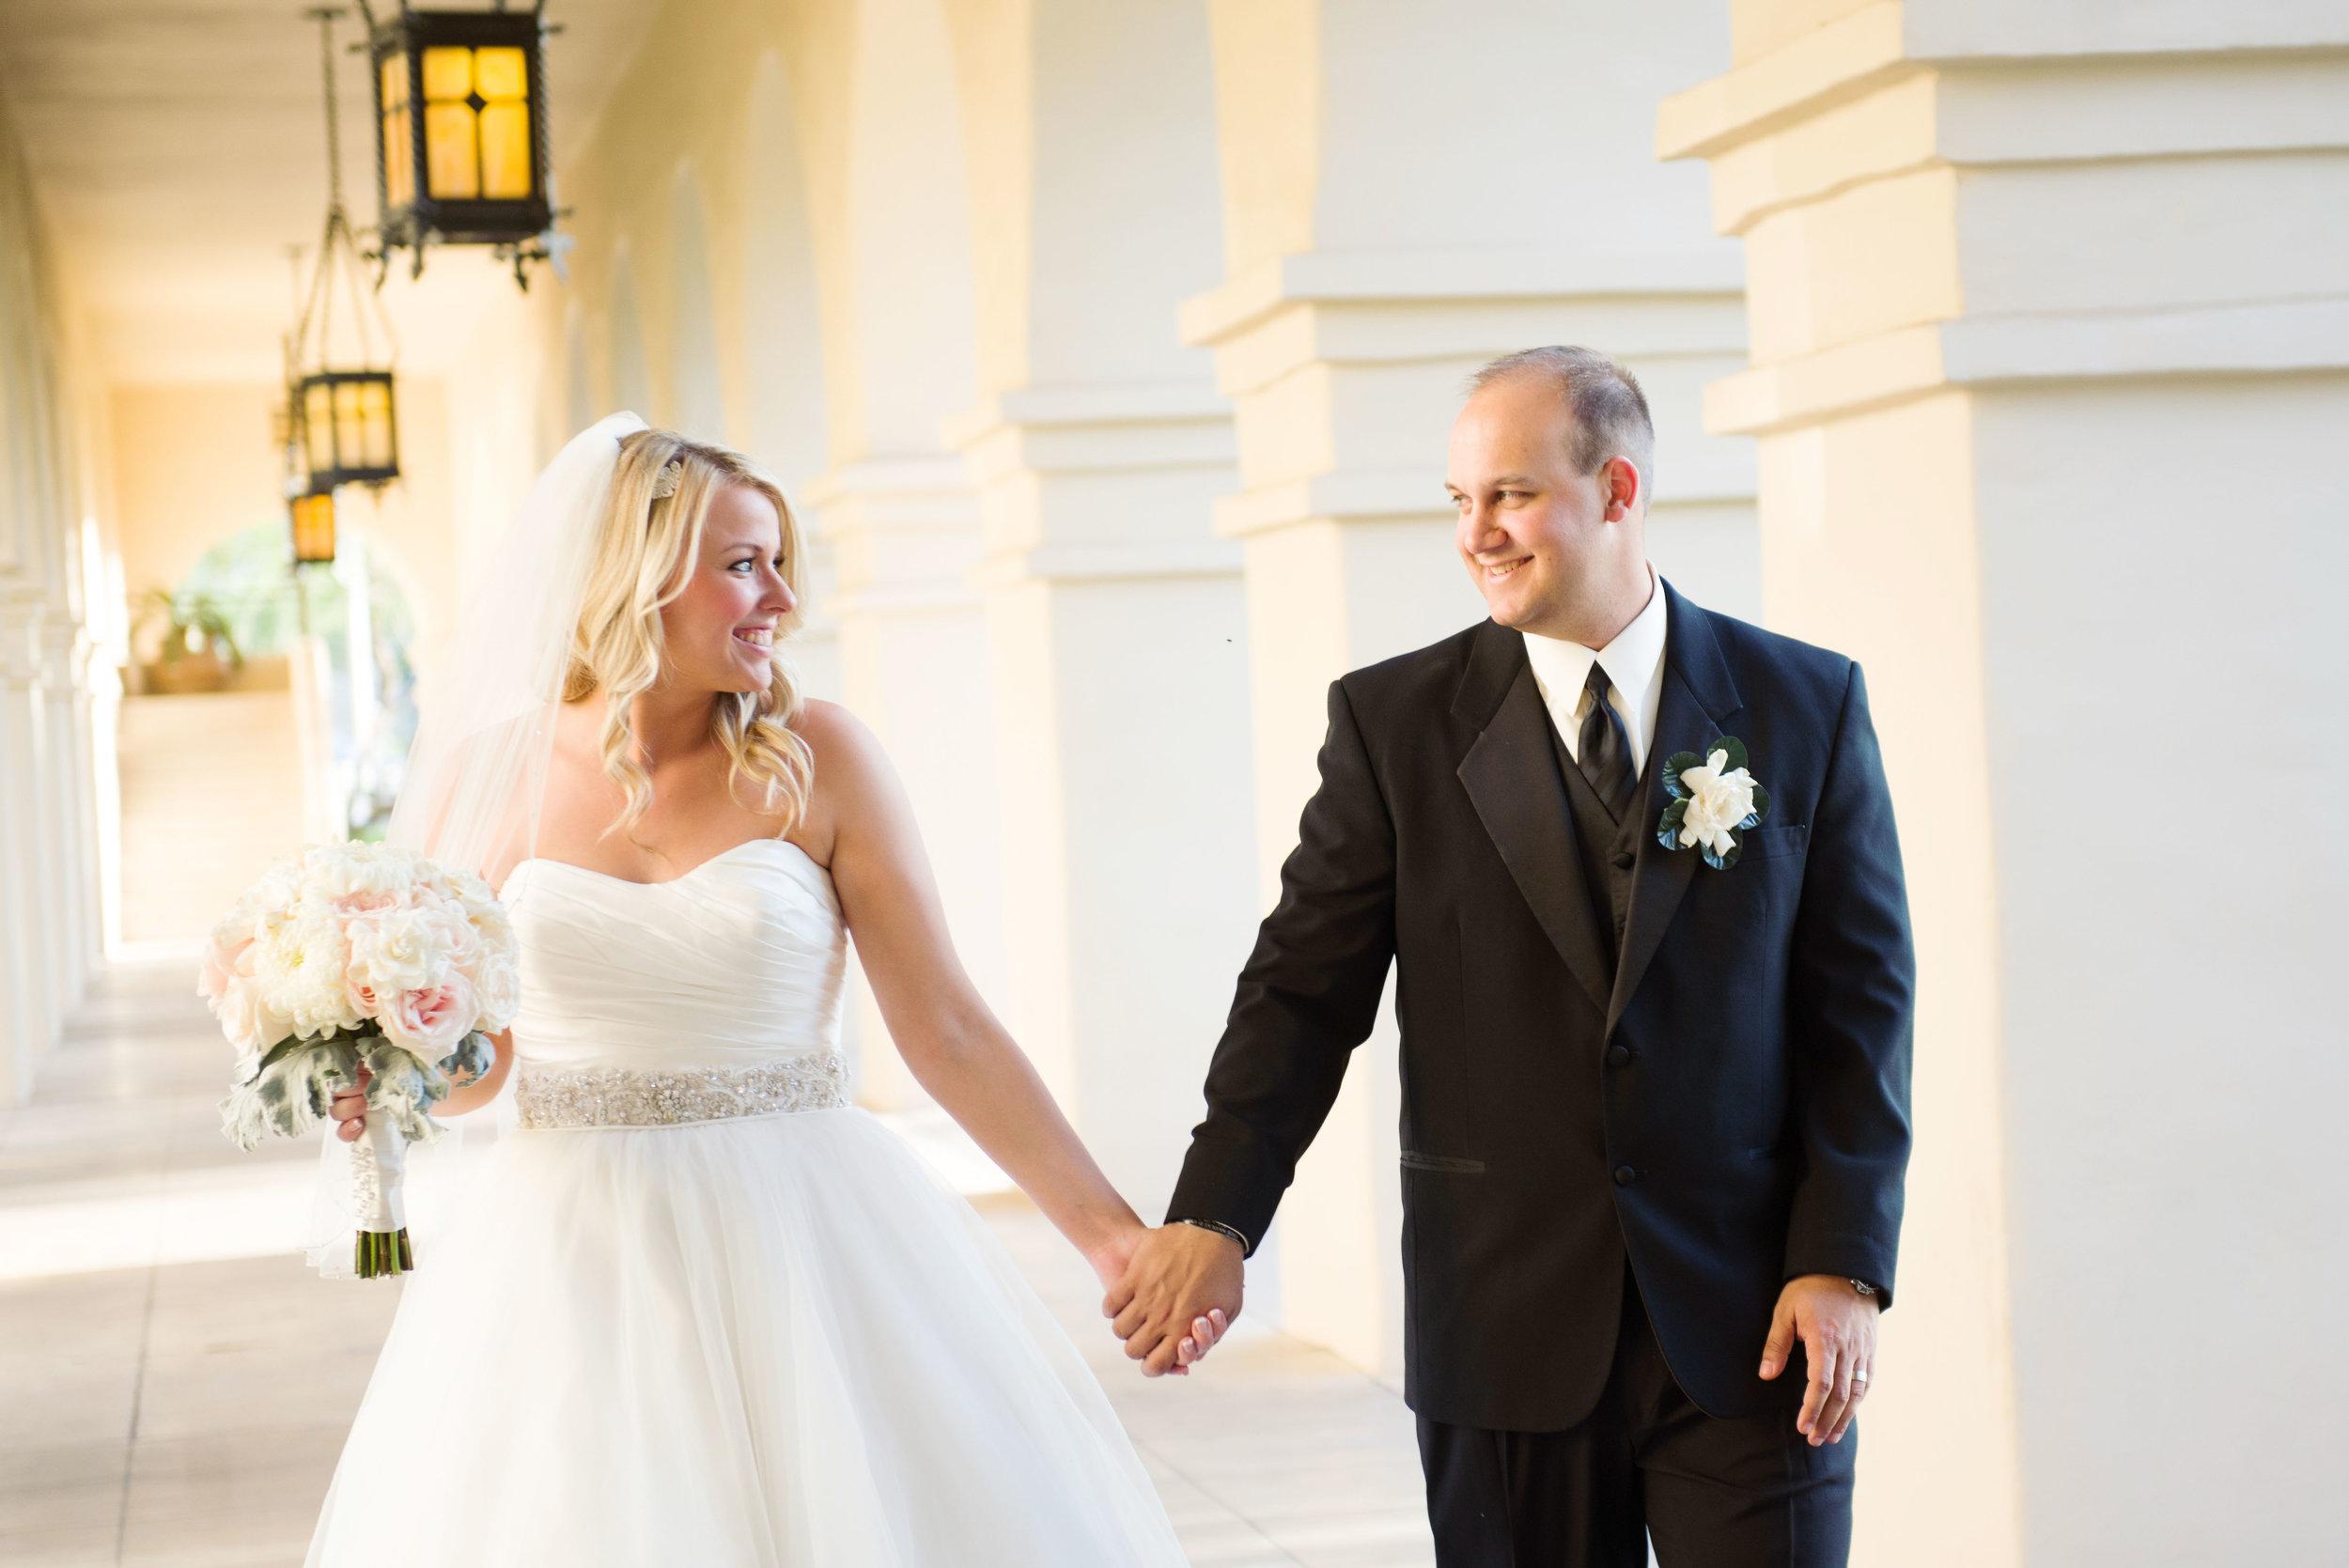 weddingwebsitesmallerpics-58.jpg